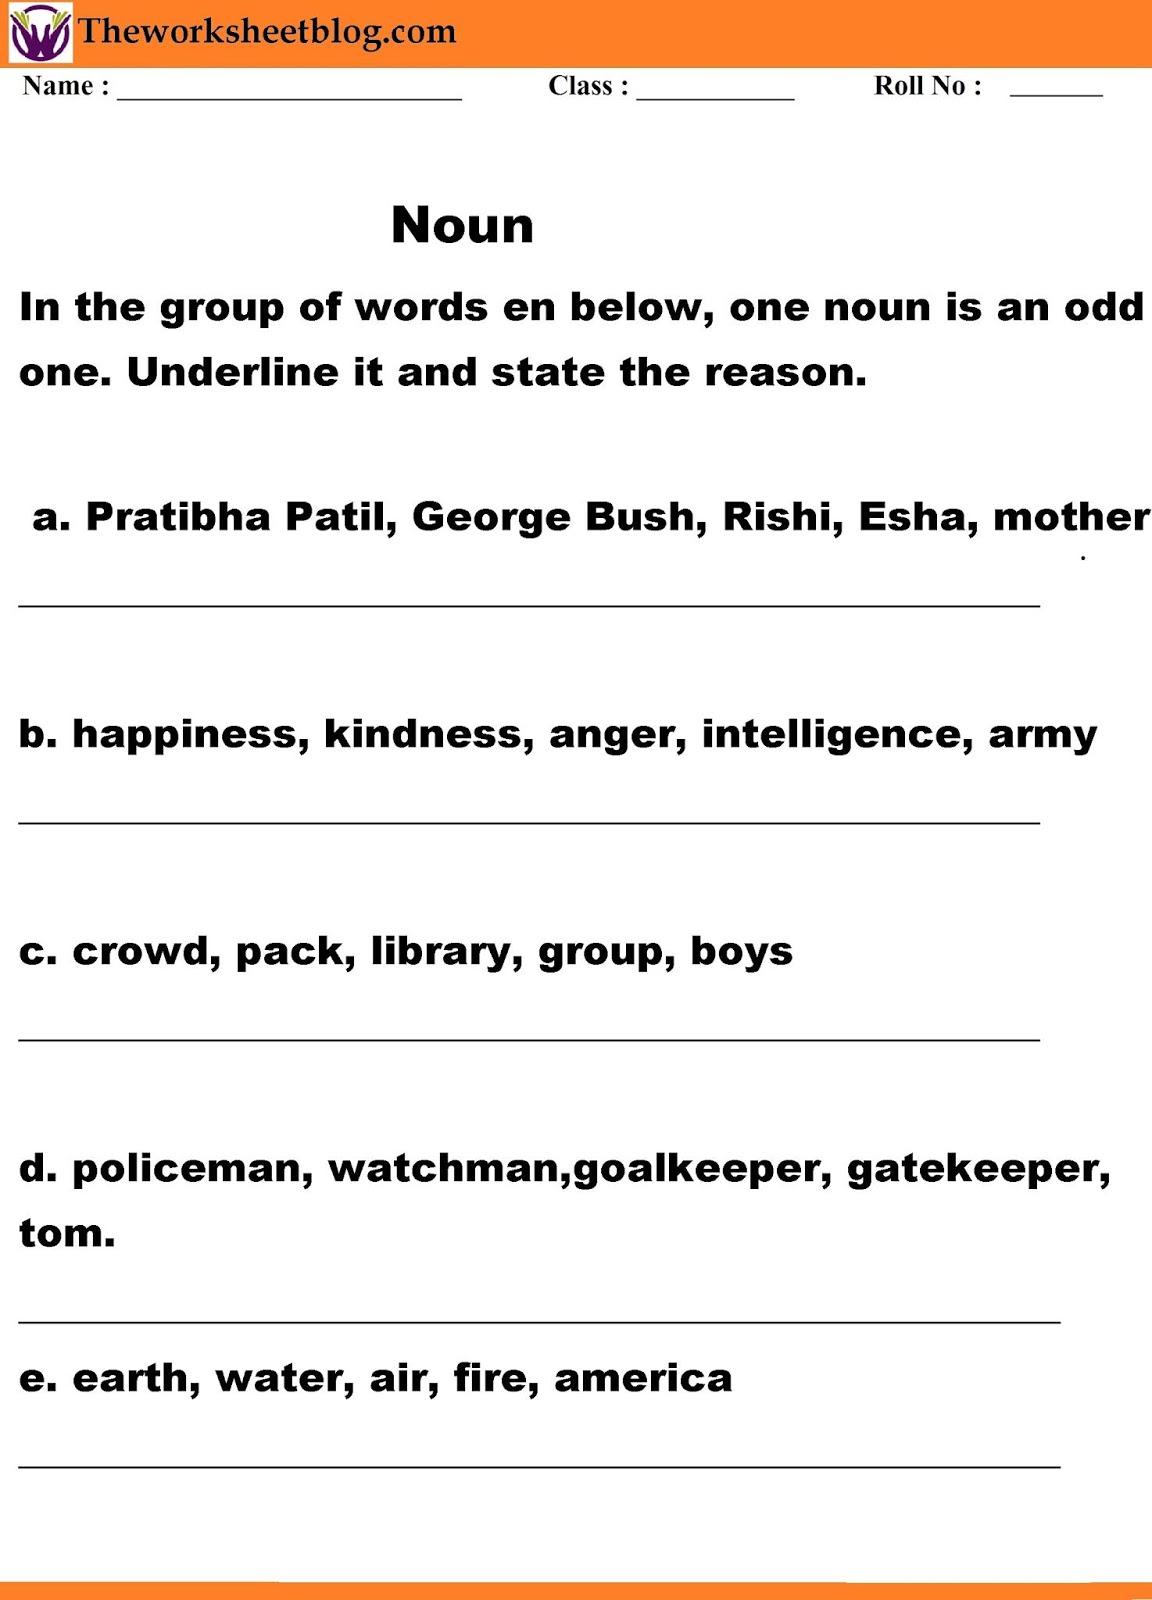 medium resolution of Noun Worksheets - Theworksheetsblog